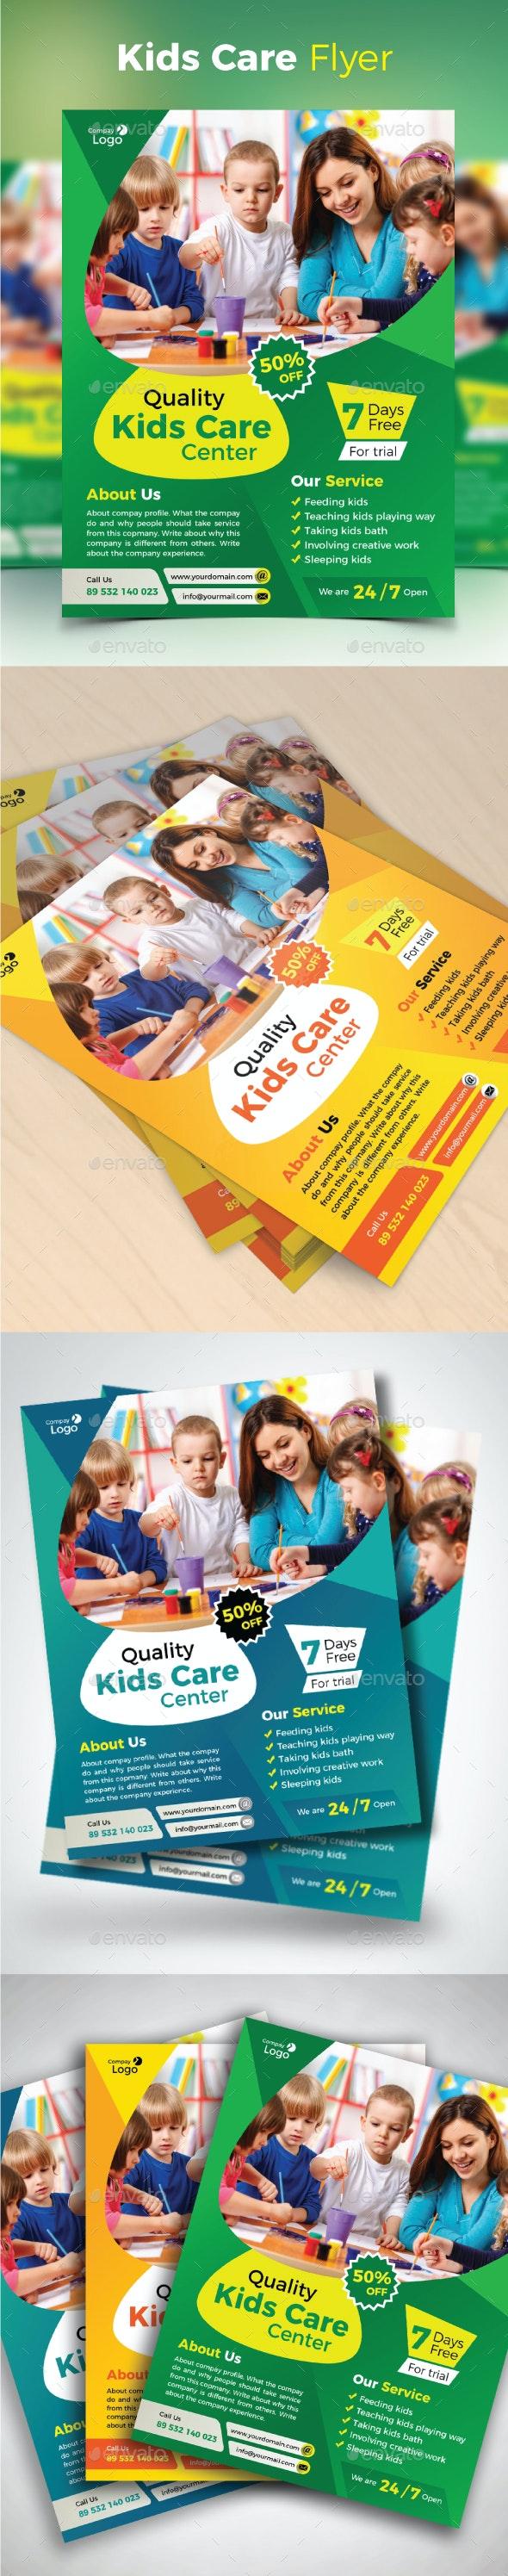 Kids Care Flyer - Corporate Flyers